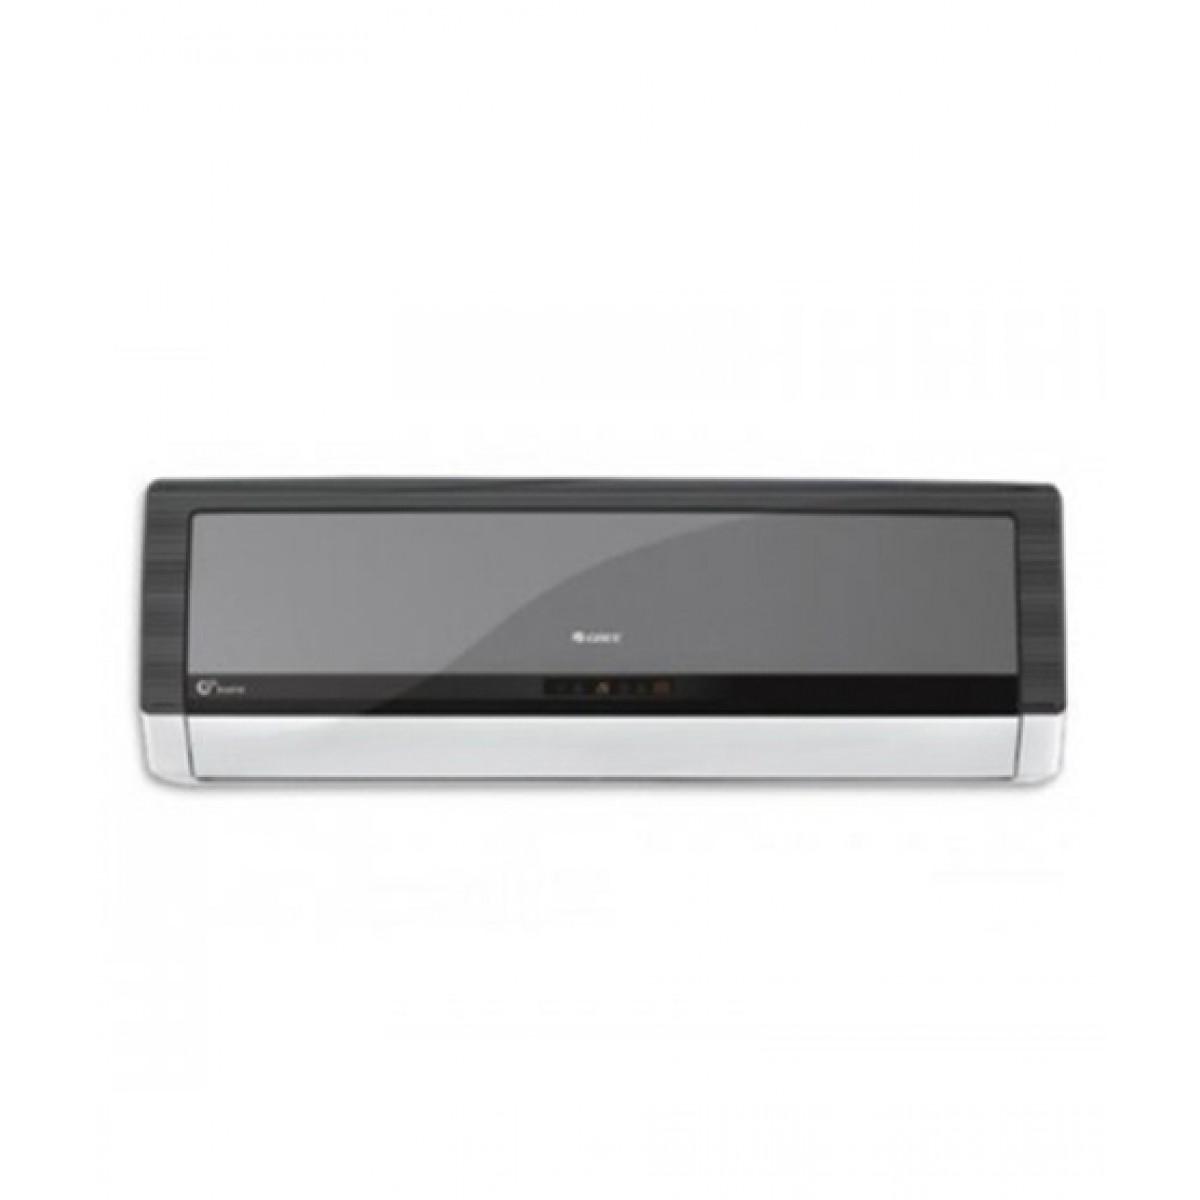 Gree G10 Inverter Split Air Conditioner Heat & Cool 1.5 Ton (GS-18CITH12G)